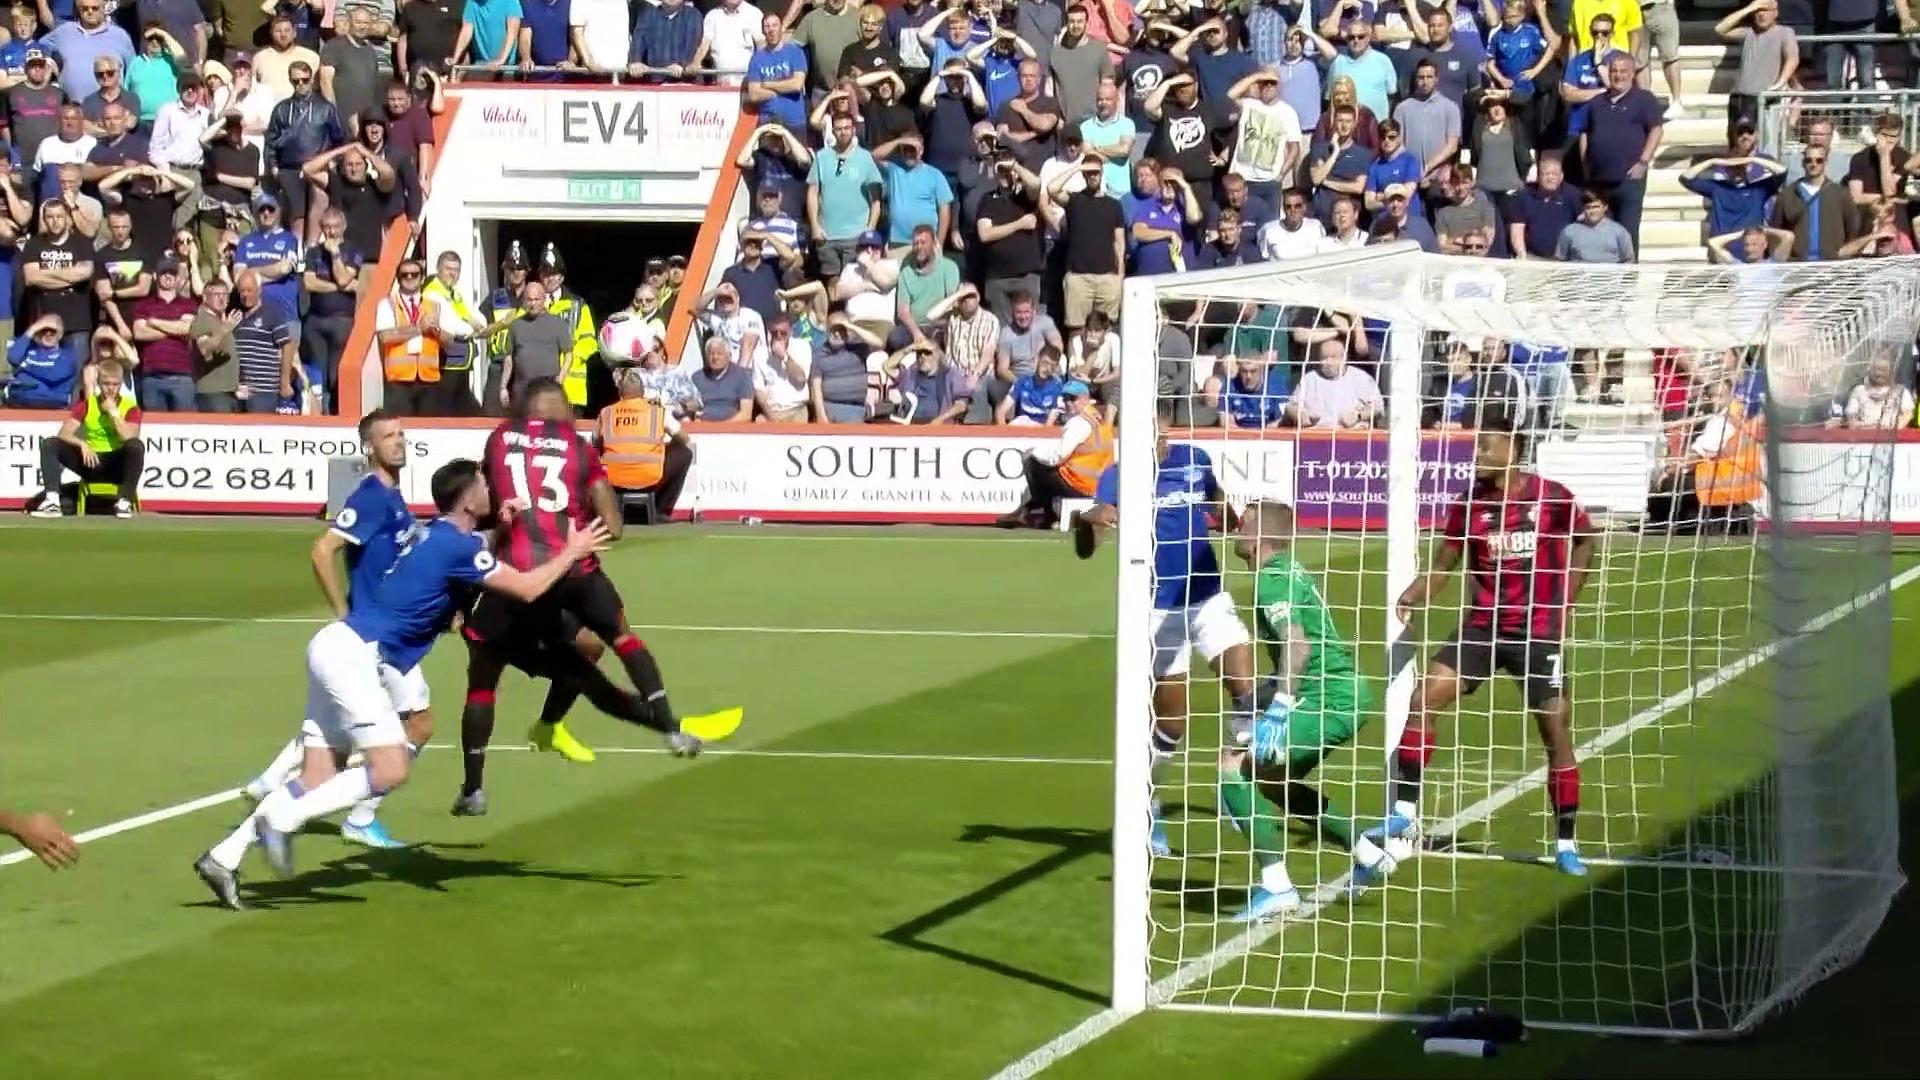 5. Hafta / Watford - Arsenal: 2-2 (Özet)